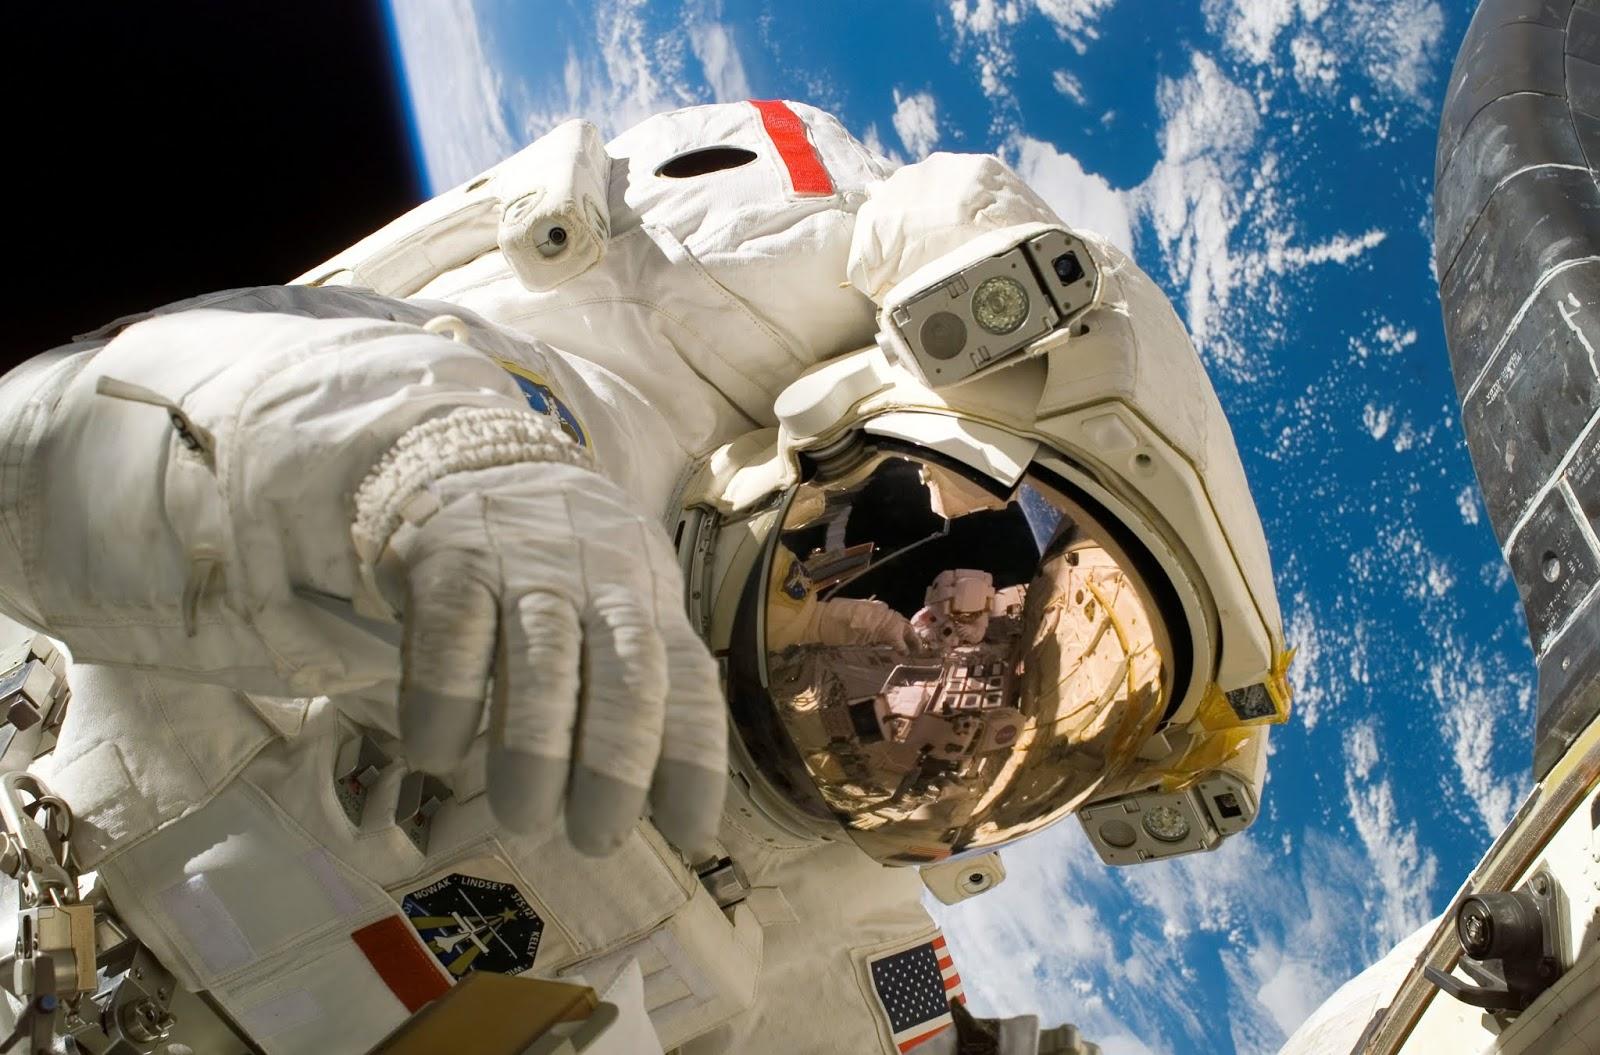 Astronaut, Earth, Space Station, Orbit, HD